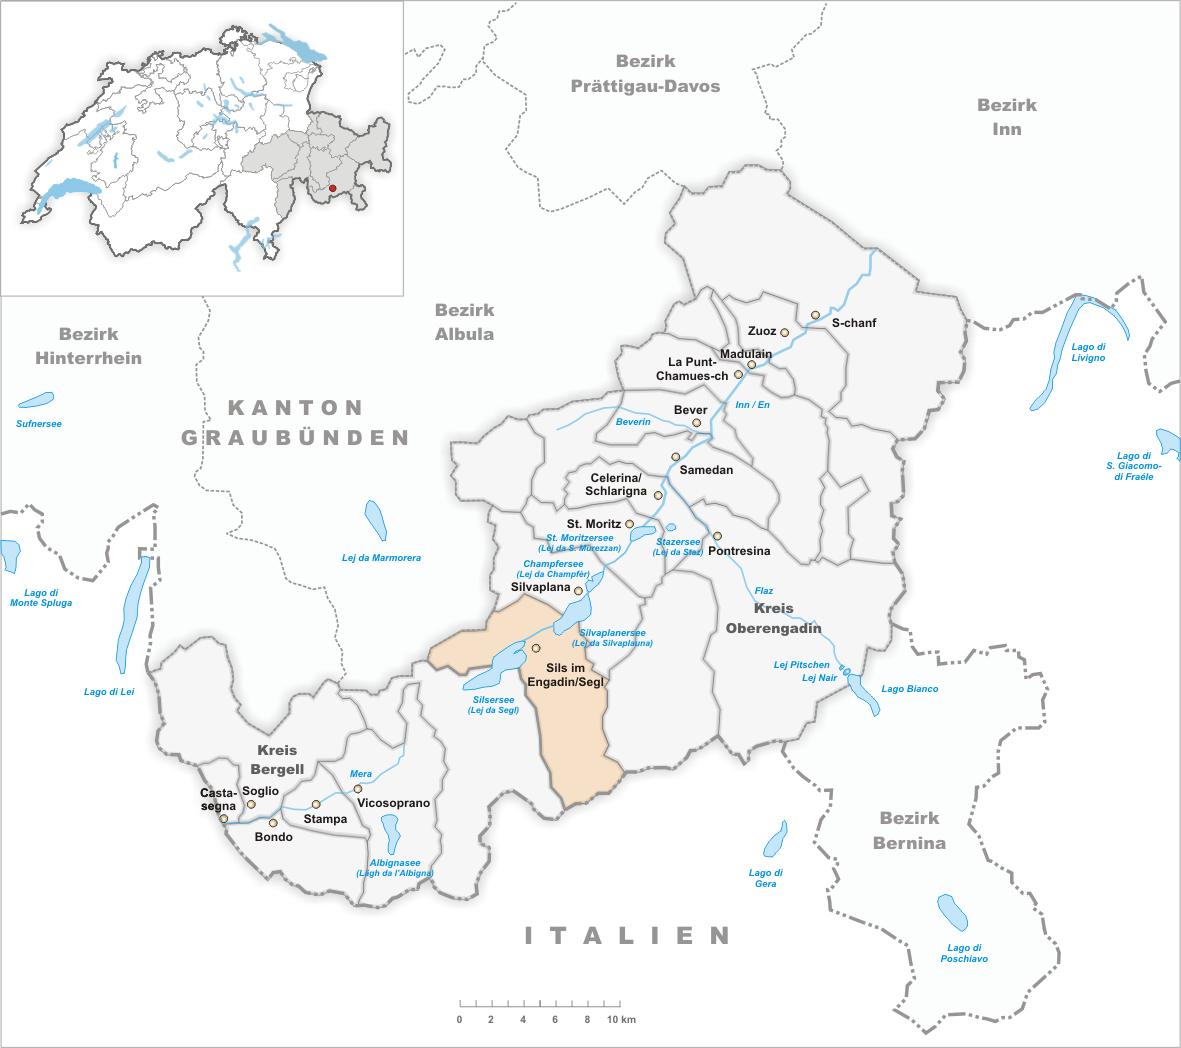 engadin karte File:Karte Gemeinde Sils im Engadin Segl 2007.png   Wikimedia Commons